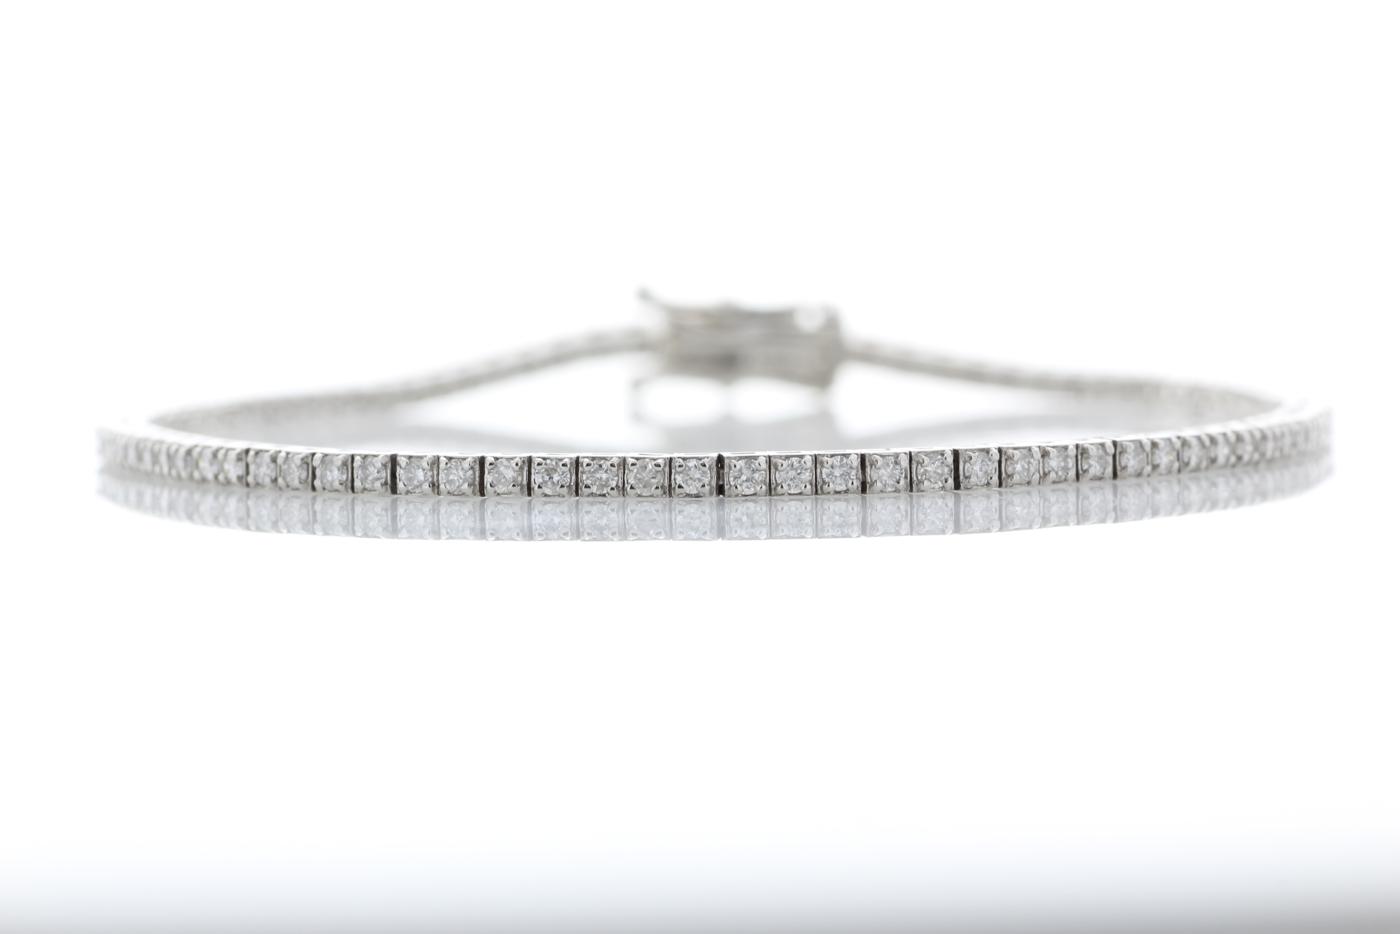 Lot 42 - 18ct White Gold Tennis Diamond Bracelet 1.11 Carats